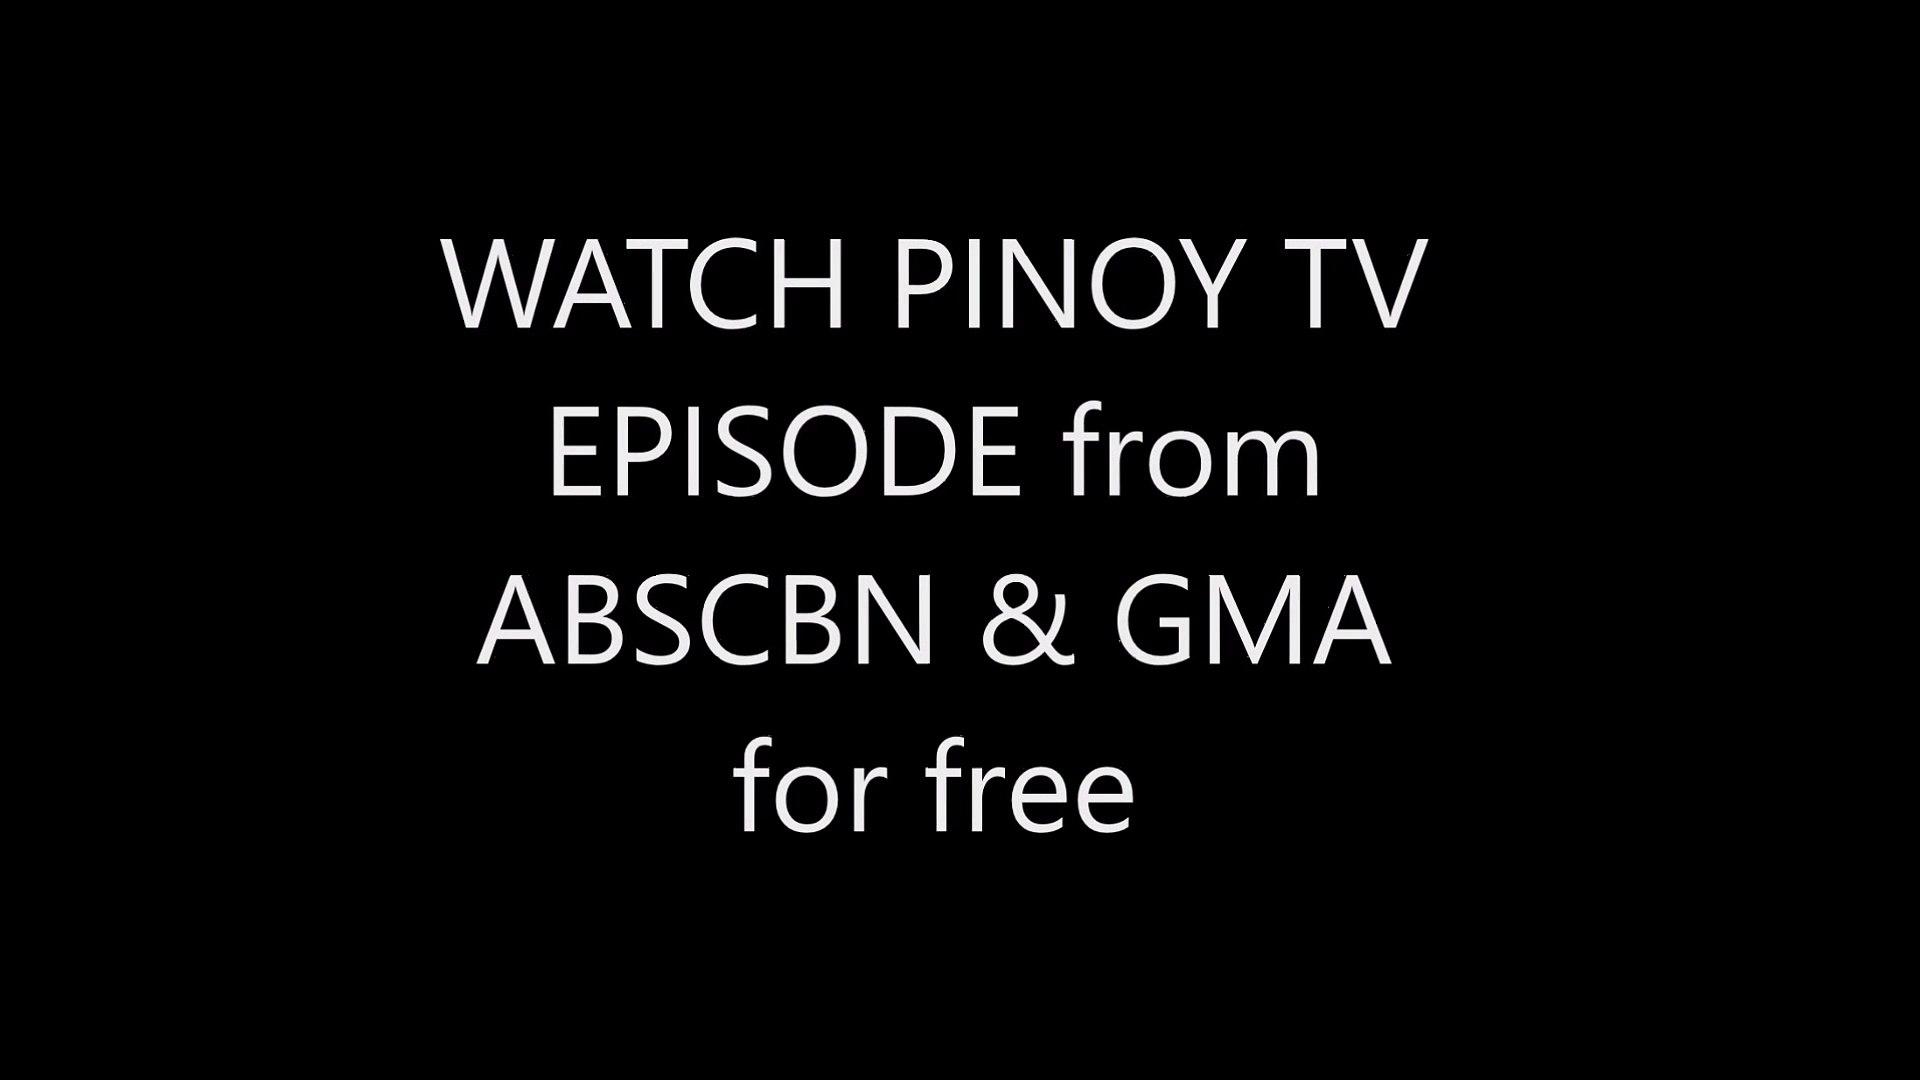 Tv Pinoy flix